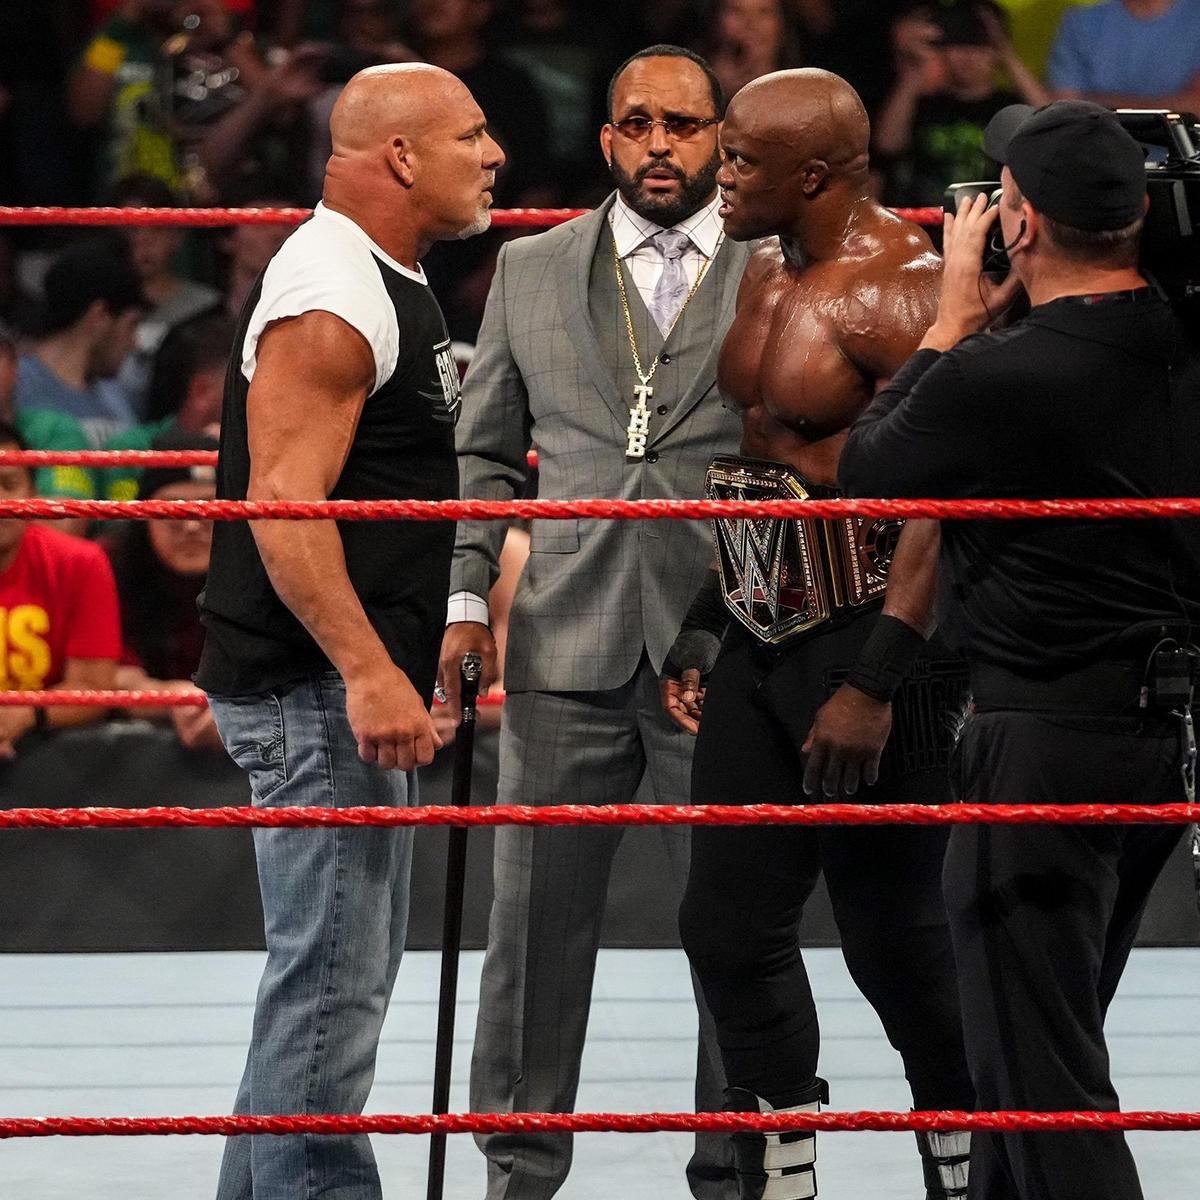 WWE SummerSlam 2021: John Cena And Goldberg Issue Title Match Challenges 2